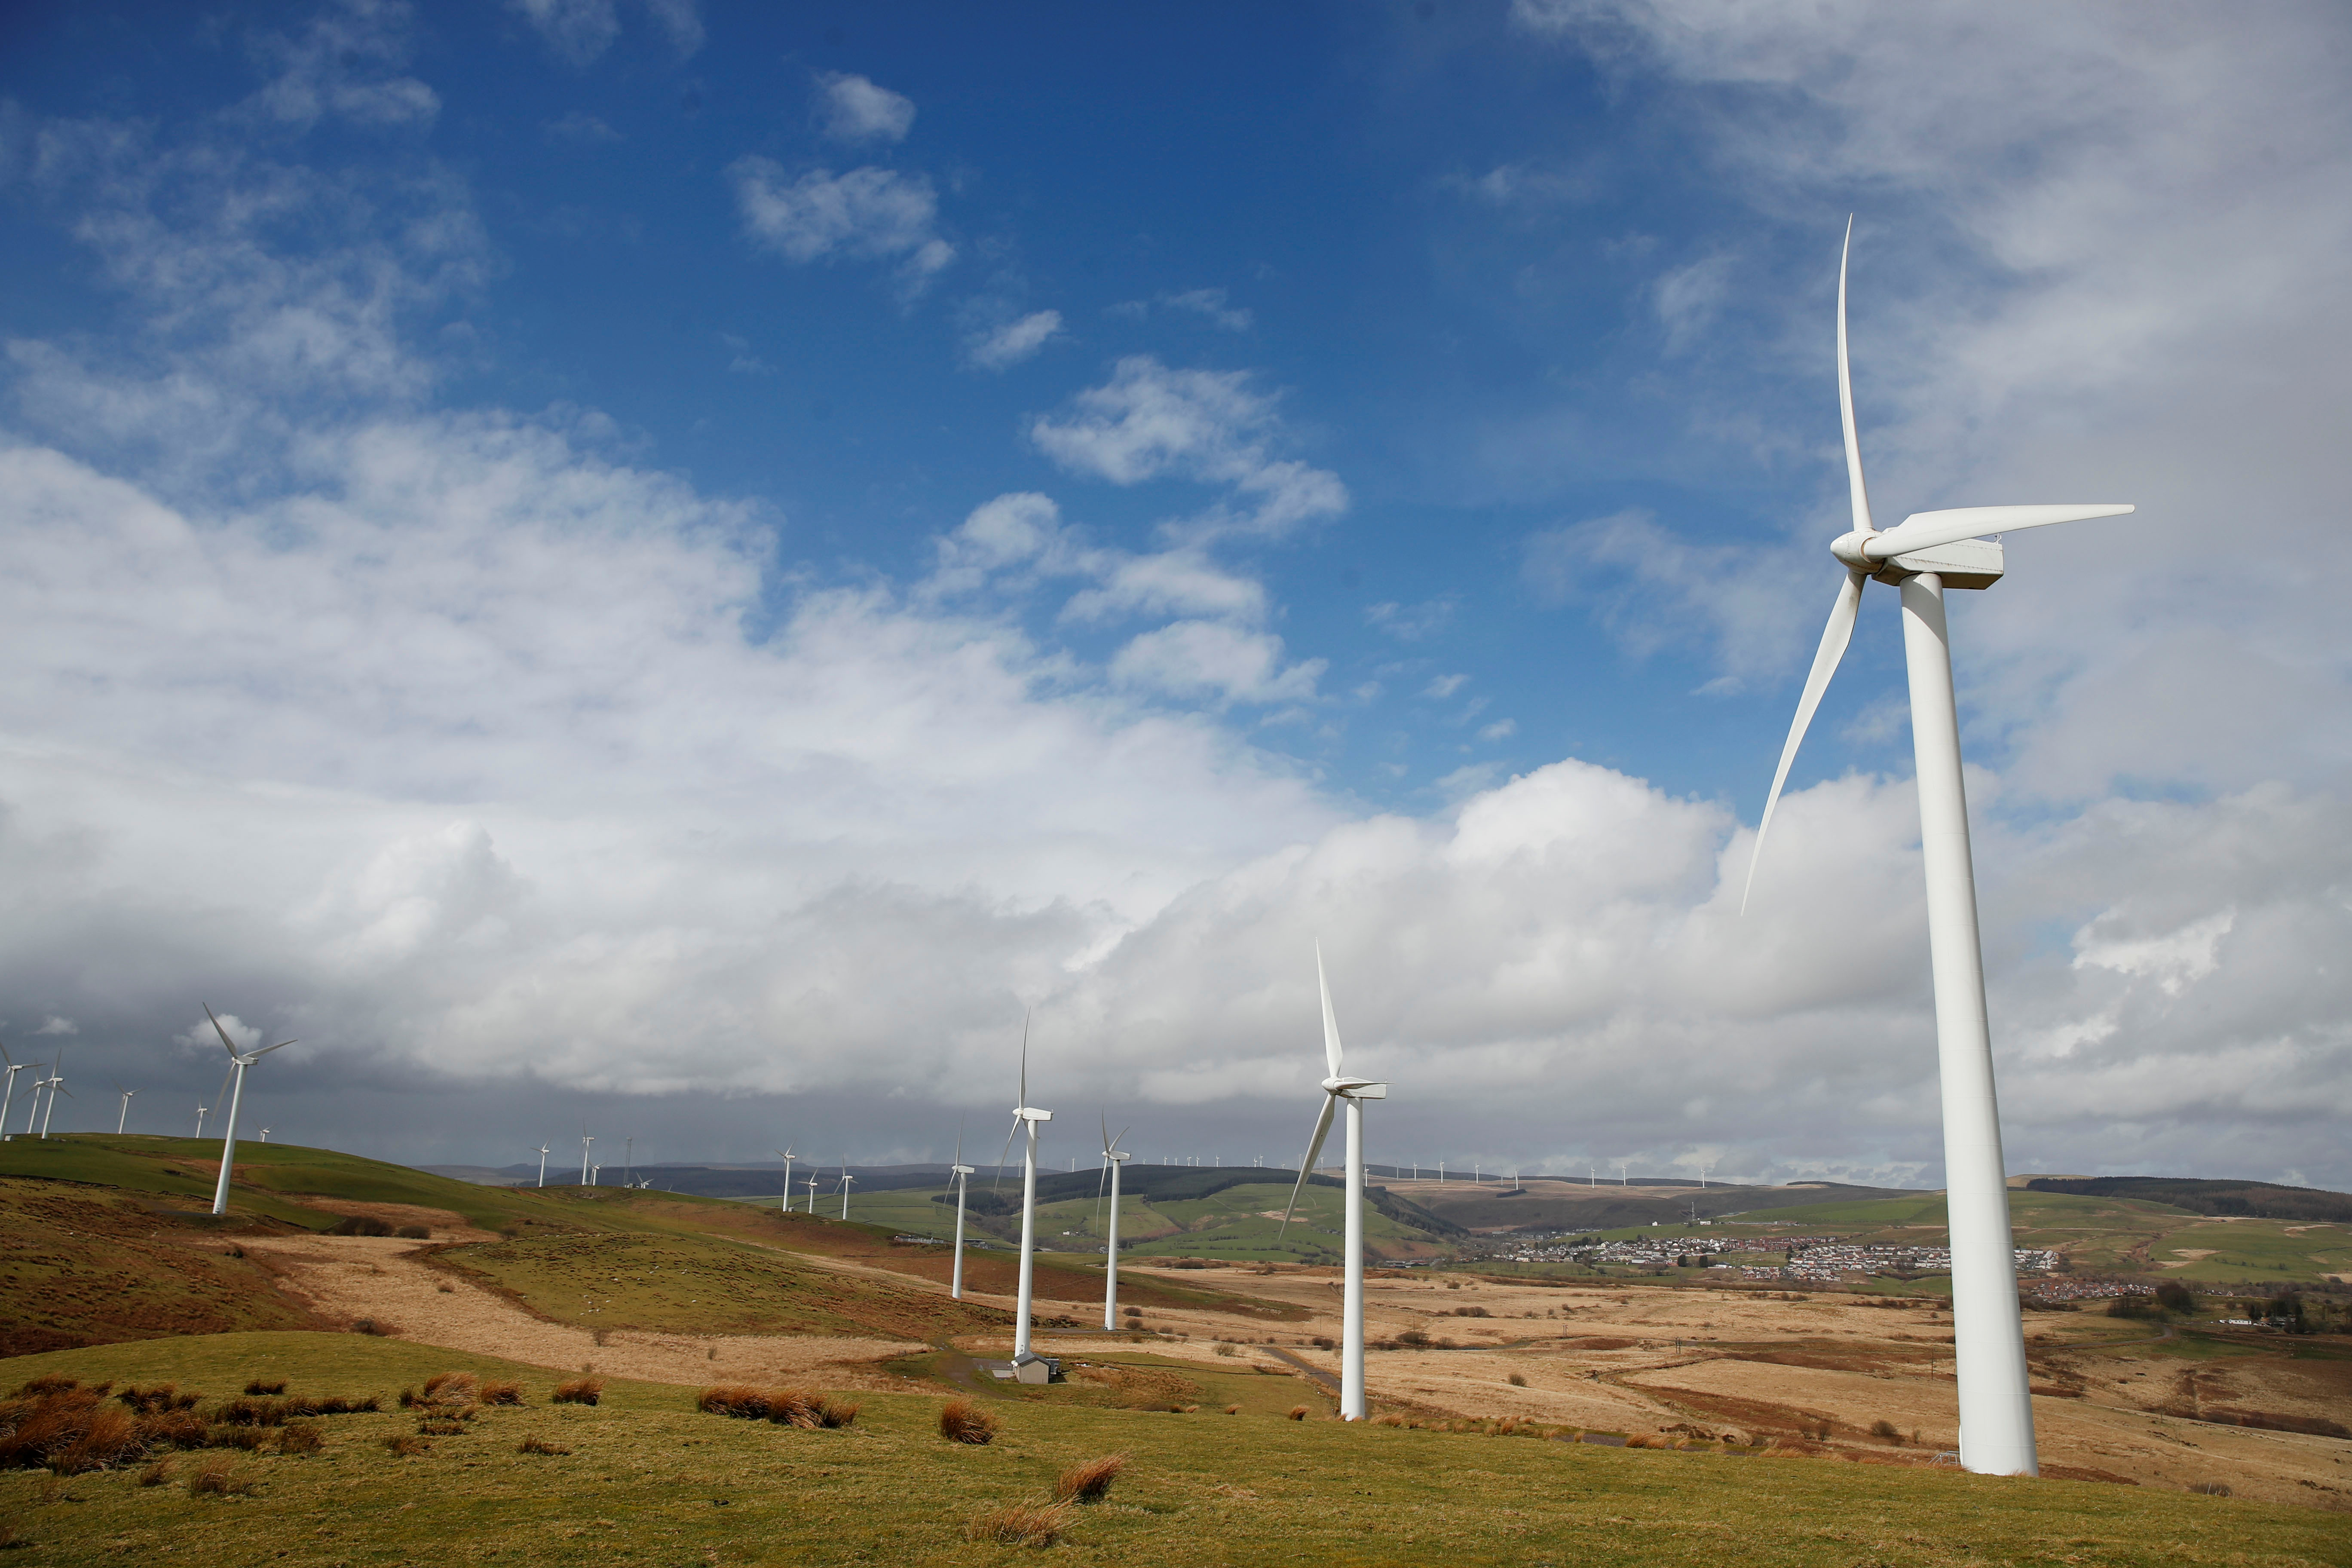 Wind turbines are seen at Mynydd Portref Wind Farm near Hendreforgan in South Wales, Britain, March 26, 2021.